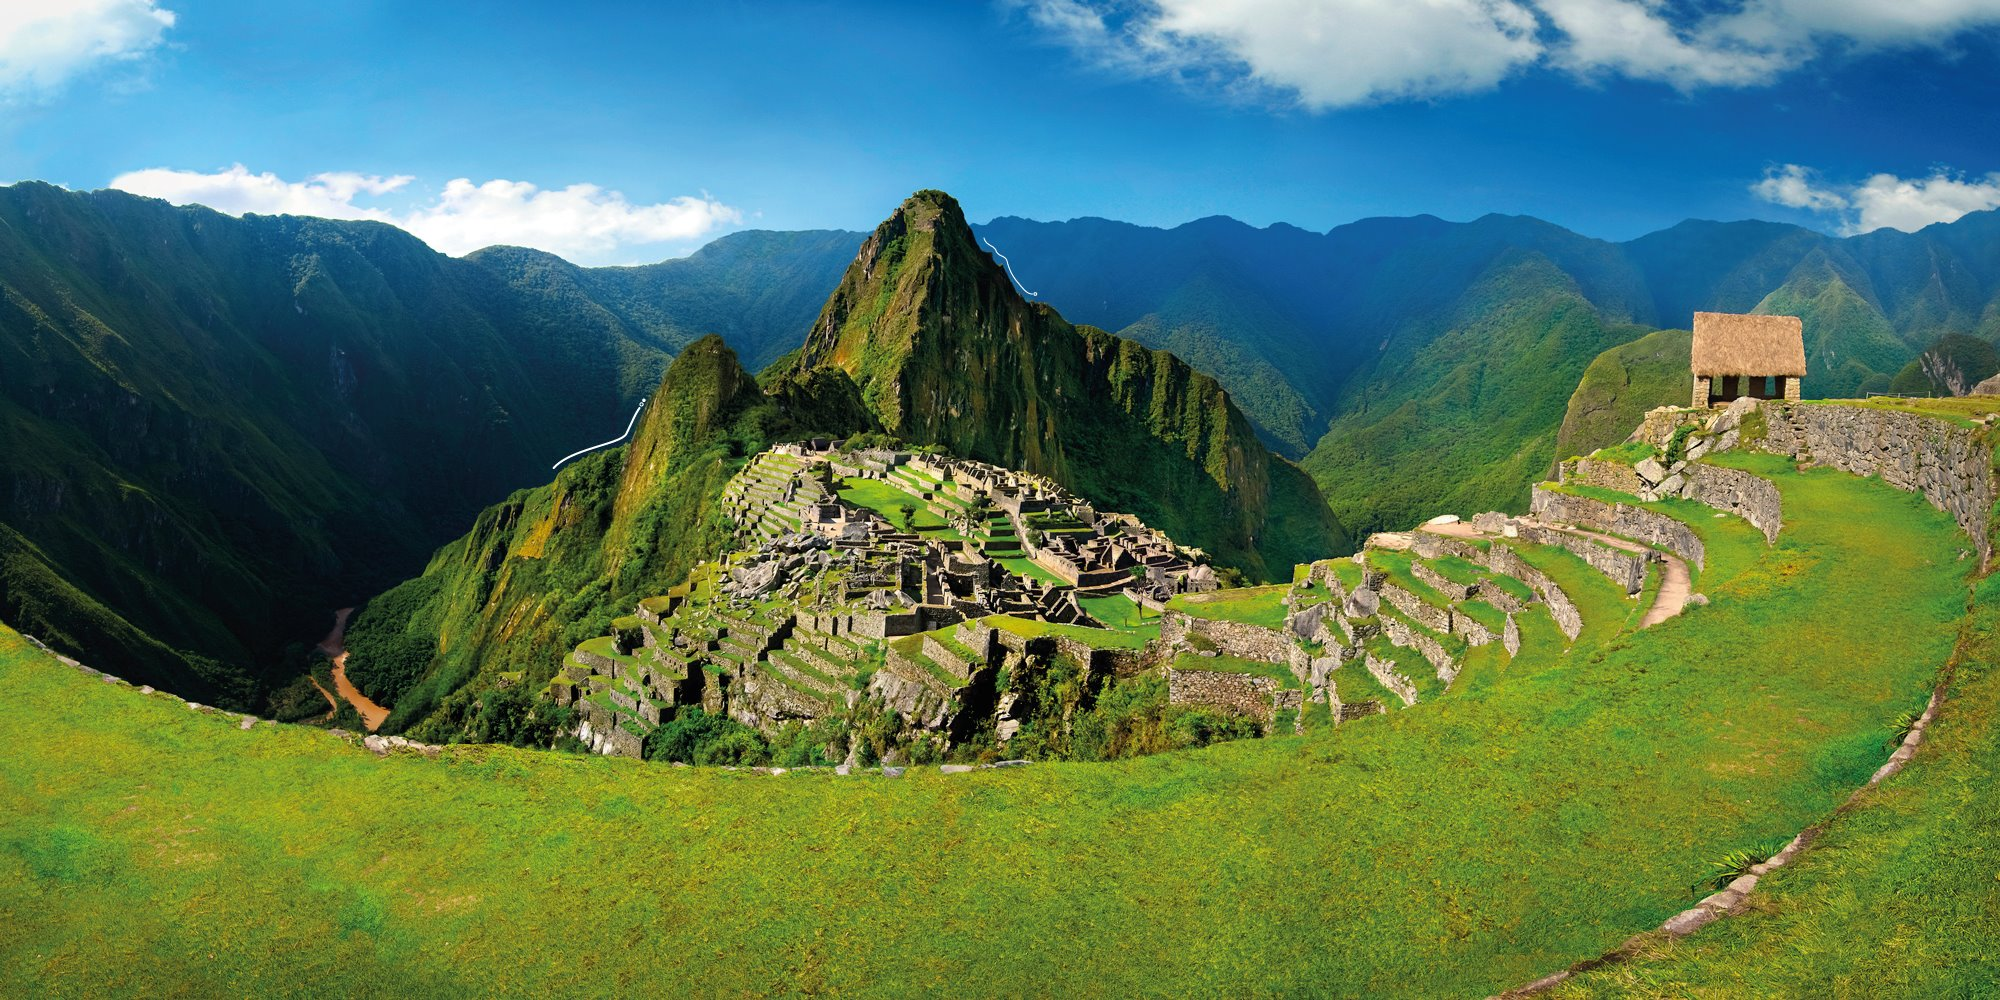 Vista panorámica de Machu Picchu - 2000x1000